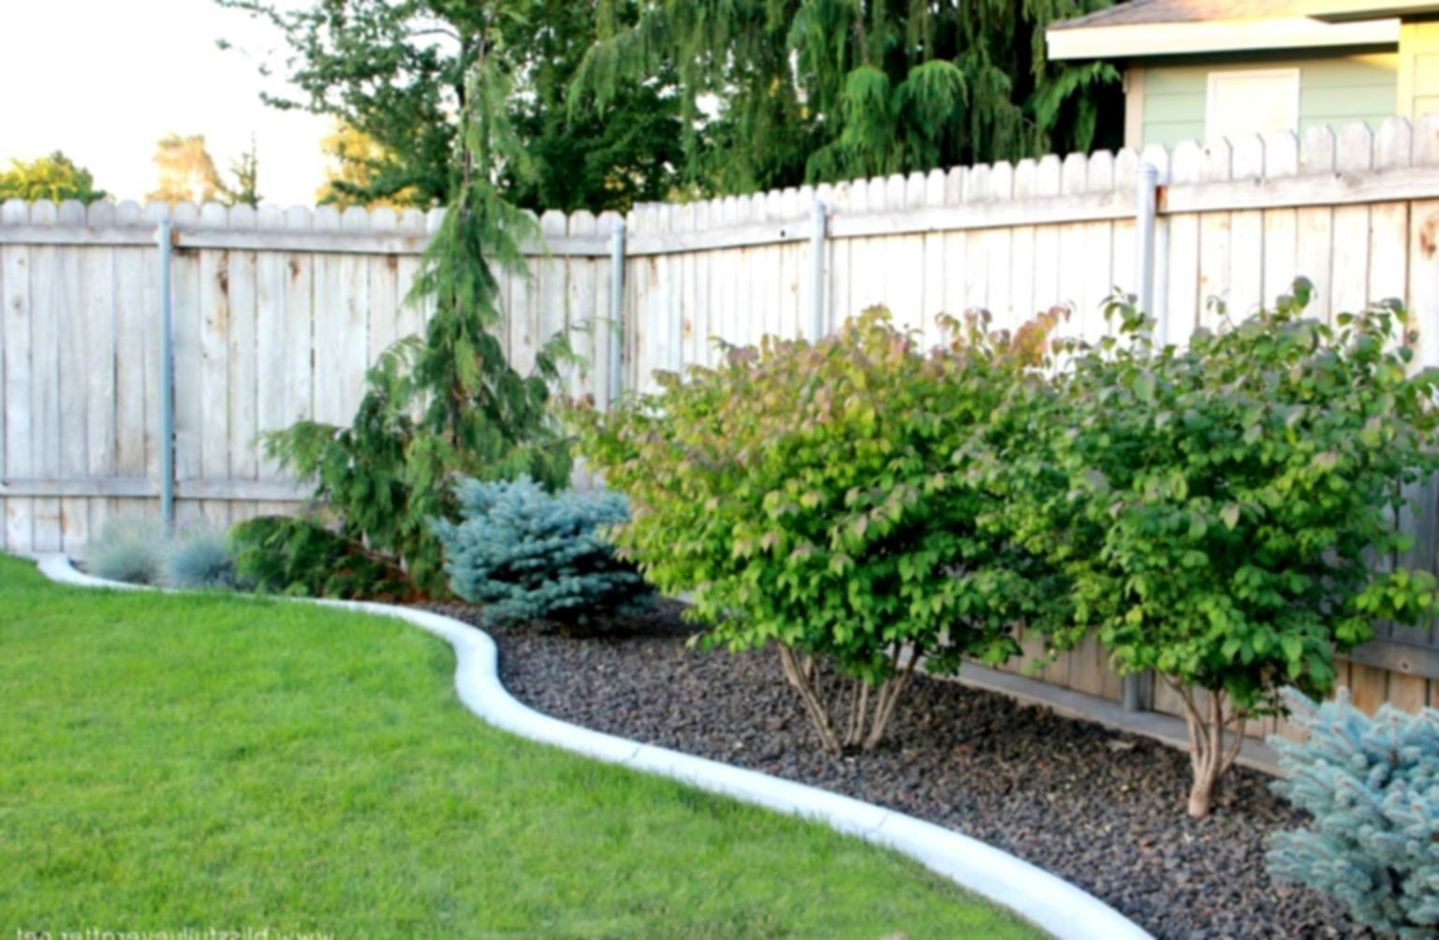 25 Simple Backyard Landscaping Design Ideas On Your Budget Large Backyard Landscaping Cheap Landscaping Ideas Easy Backyard Landscaping Backyard garden ideas simple